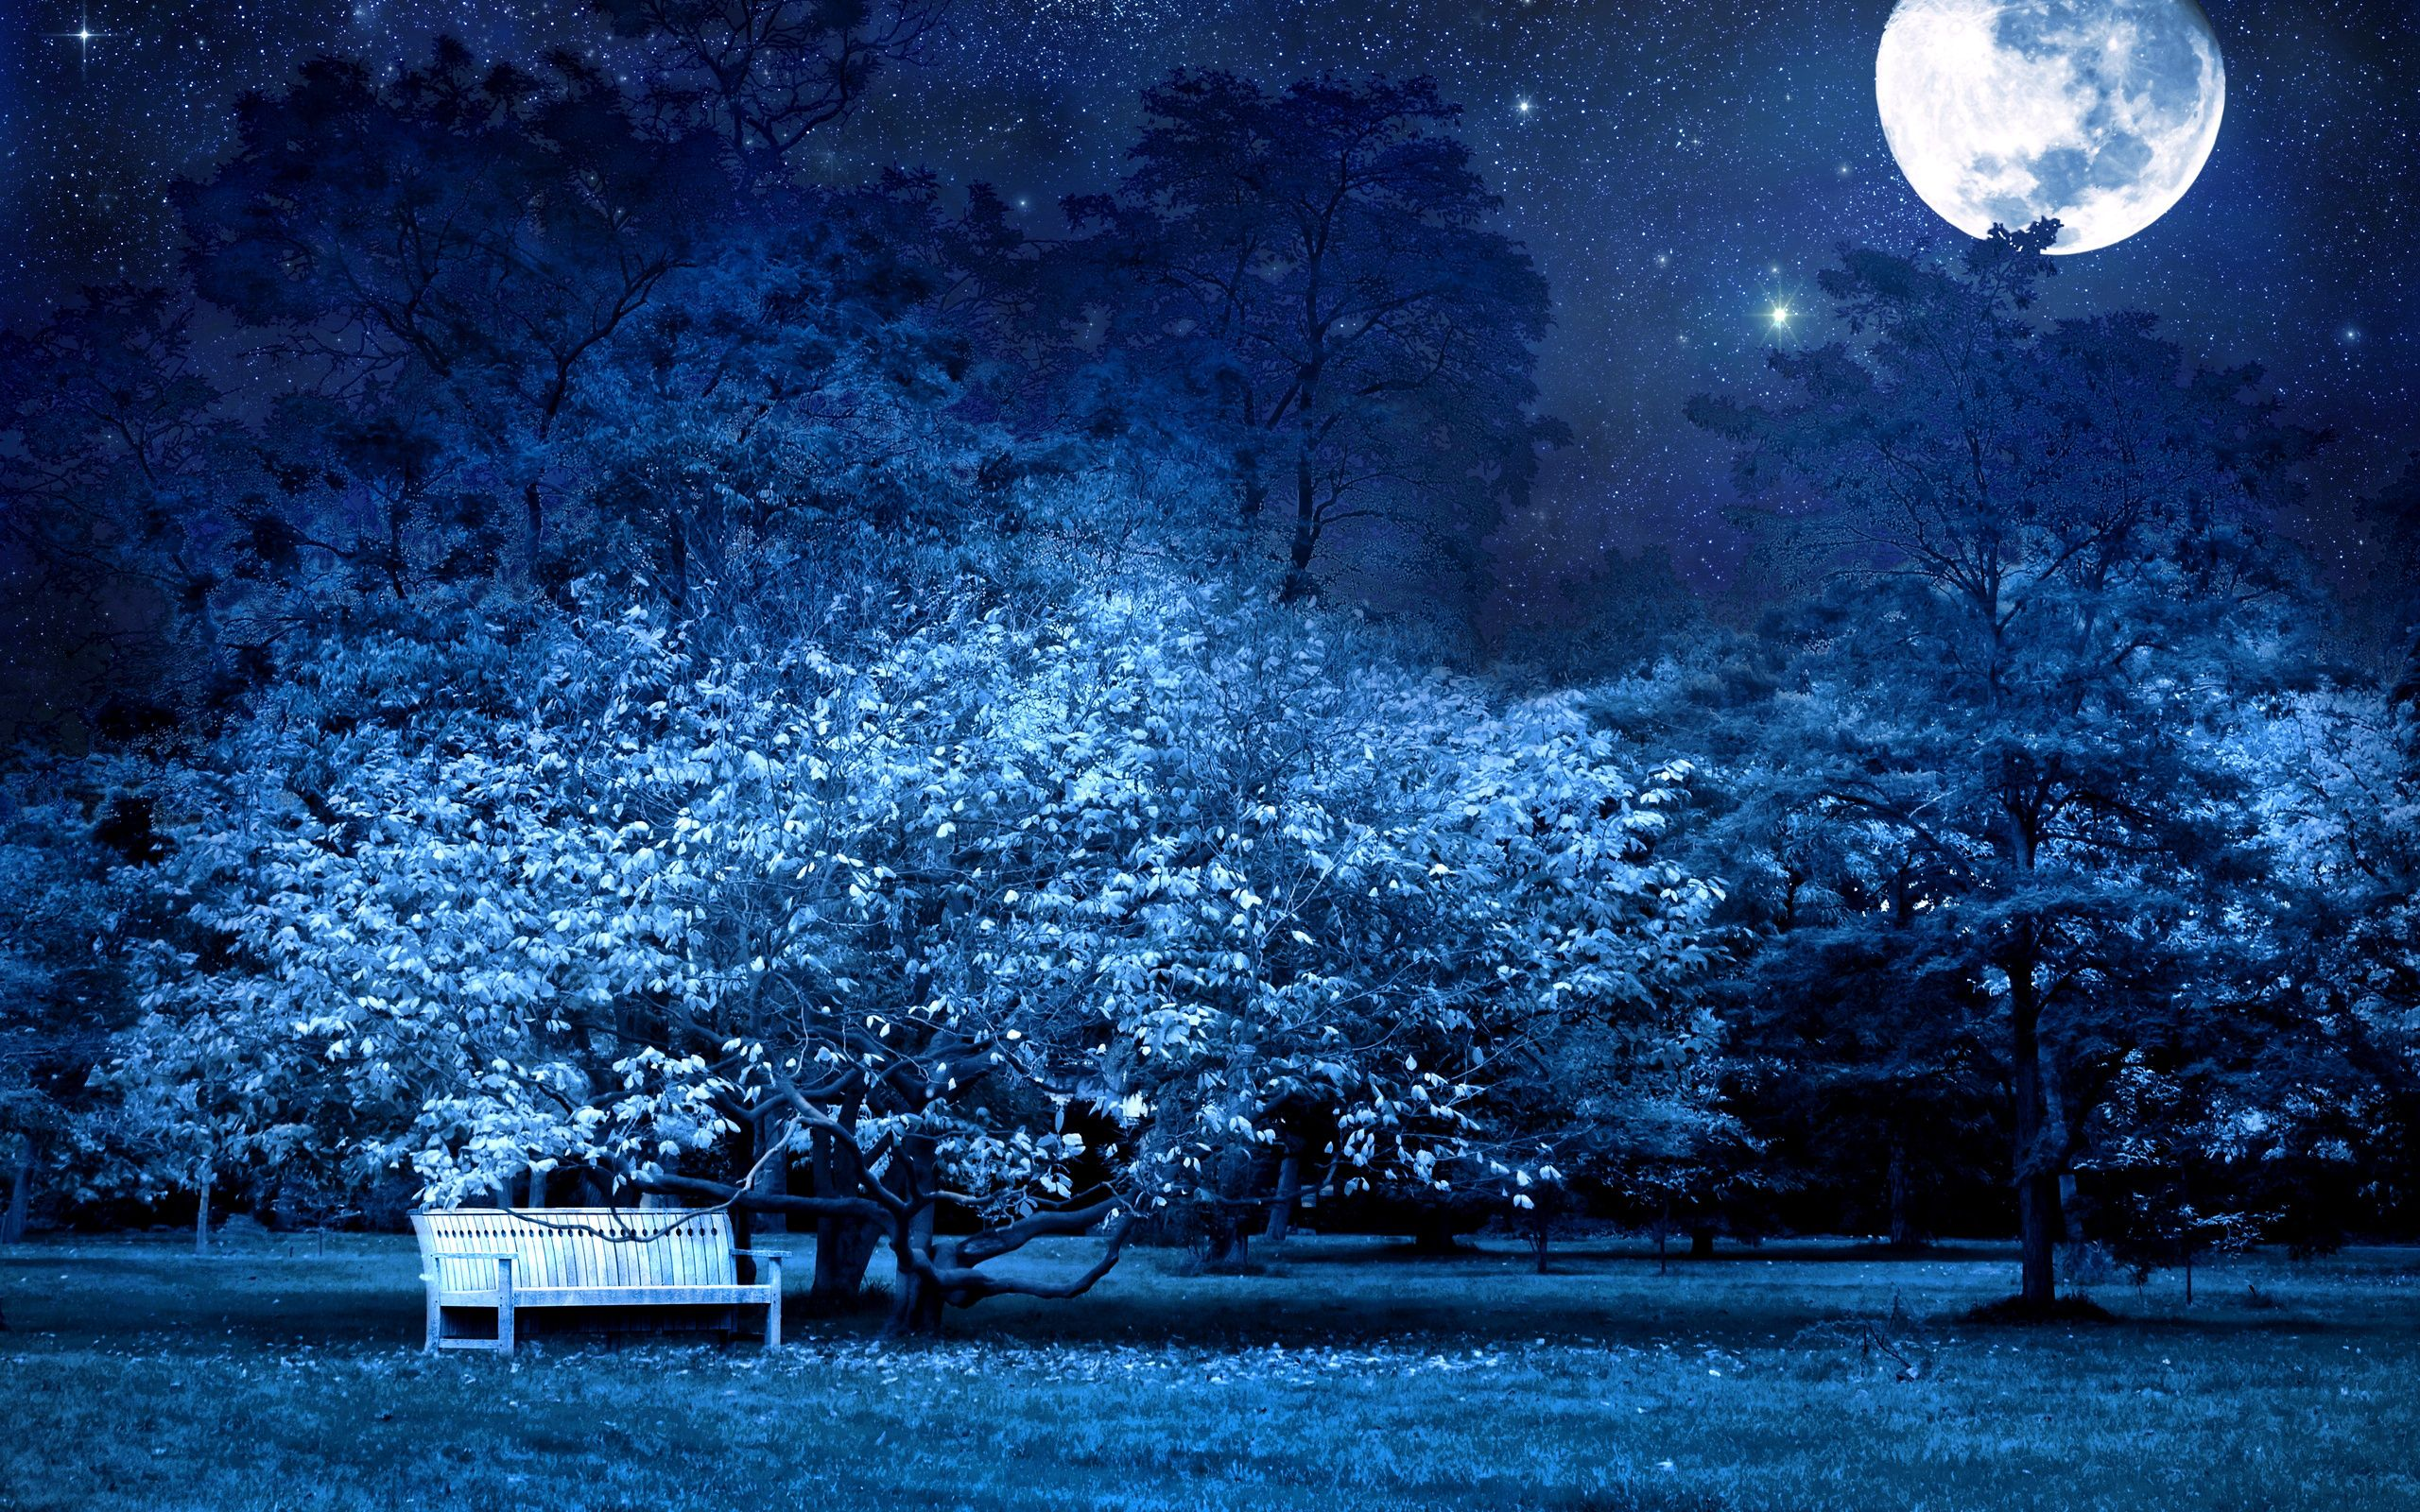 Wallpaper Nature Park Night Moon Tree Bench Secret